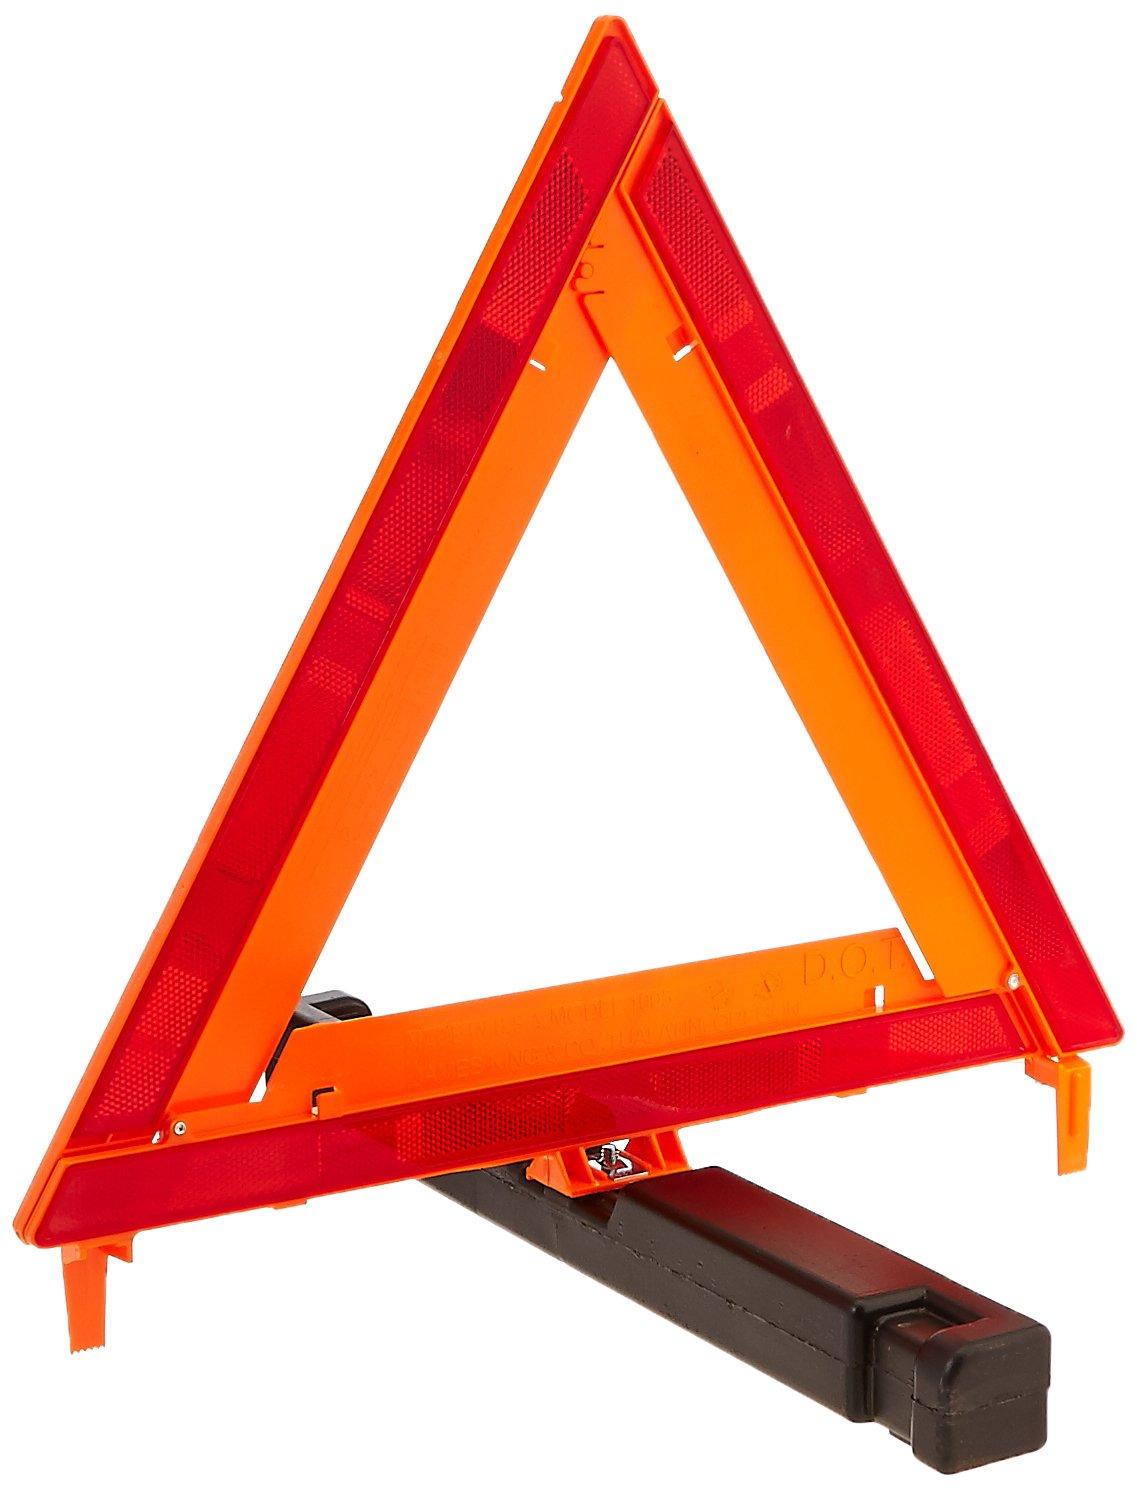 Quantity 4 James King 1005-1 Warning Triangle, Set of 3